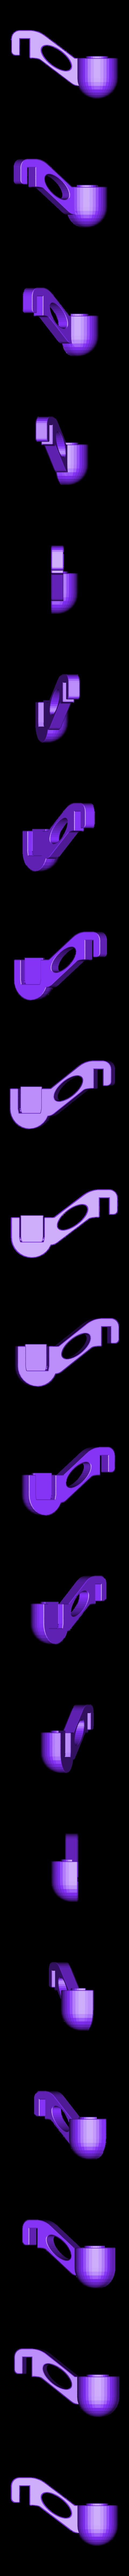 repaired_left-spool-holder-1.stl Download free STL file Quick change filament holder • 3D print design, TheJimReaper